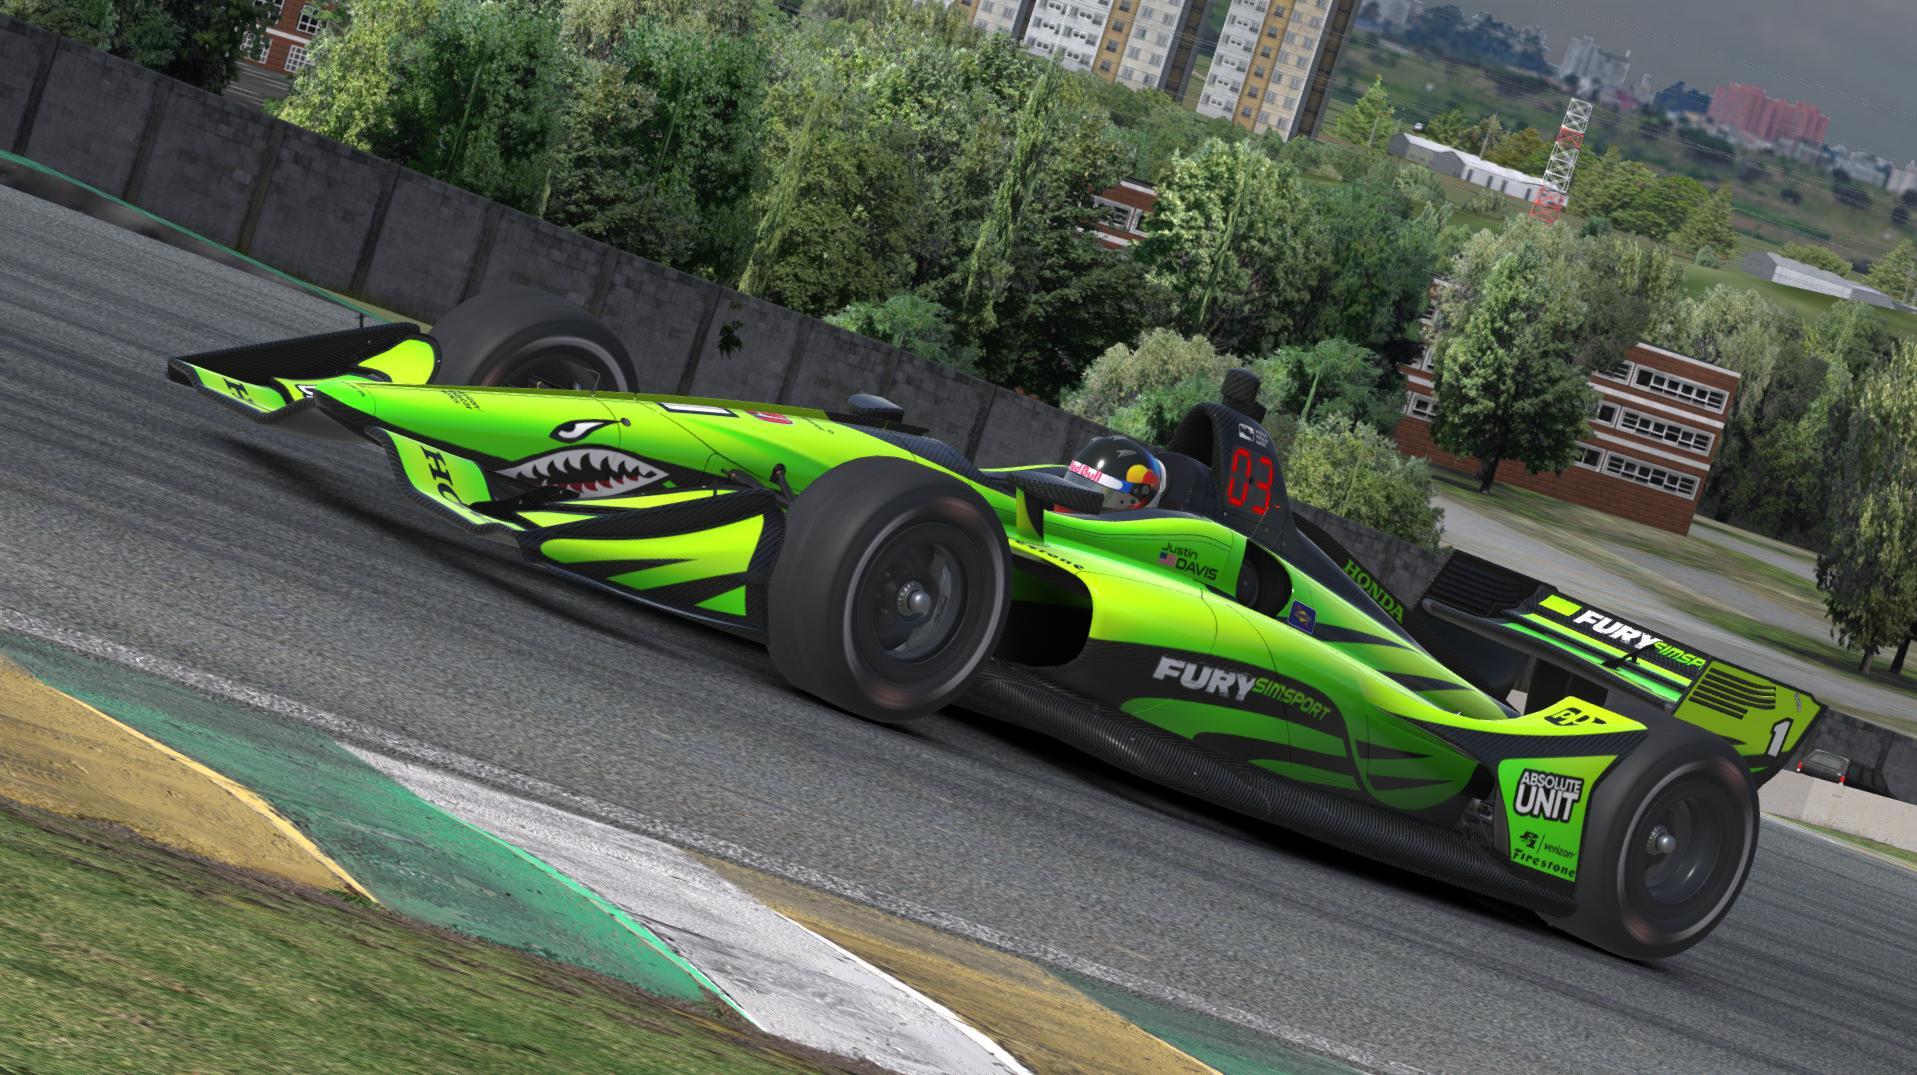 Preview of FURY SIMSPORT Dallara IR18 by Justin S Davis